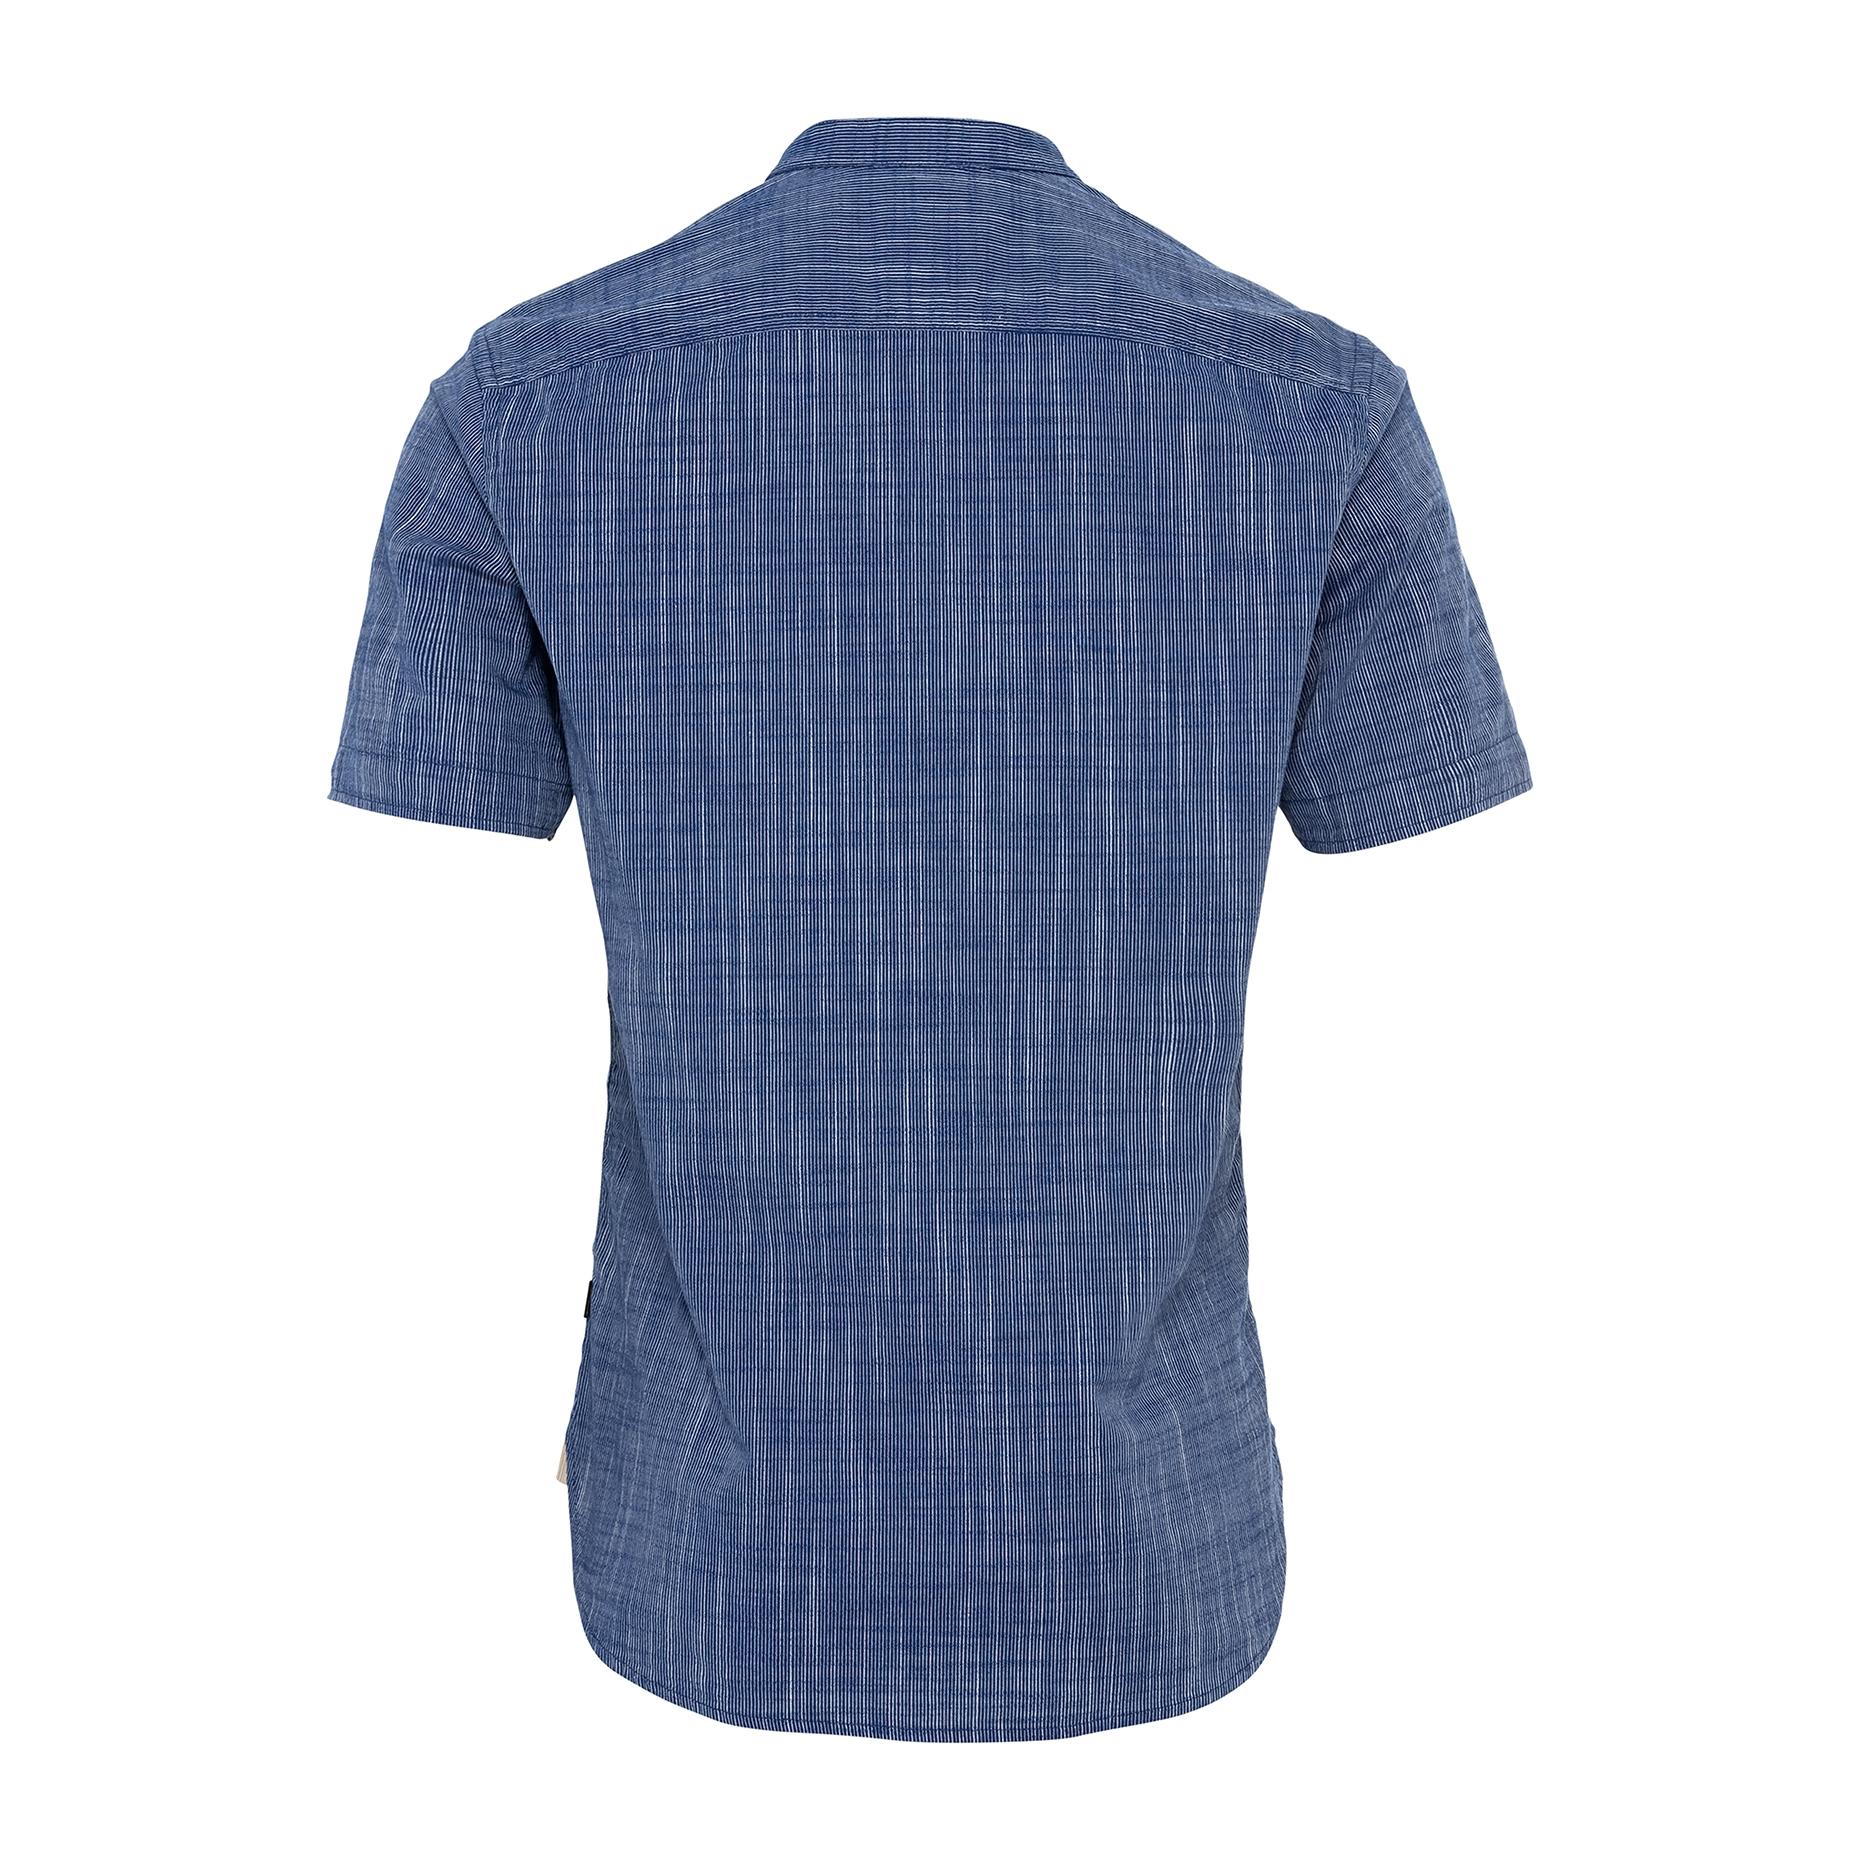 Camel active kurzarm Hemd blau meliert 5S45409227 46